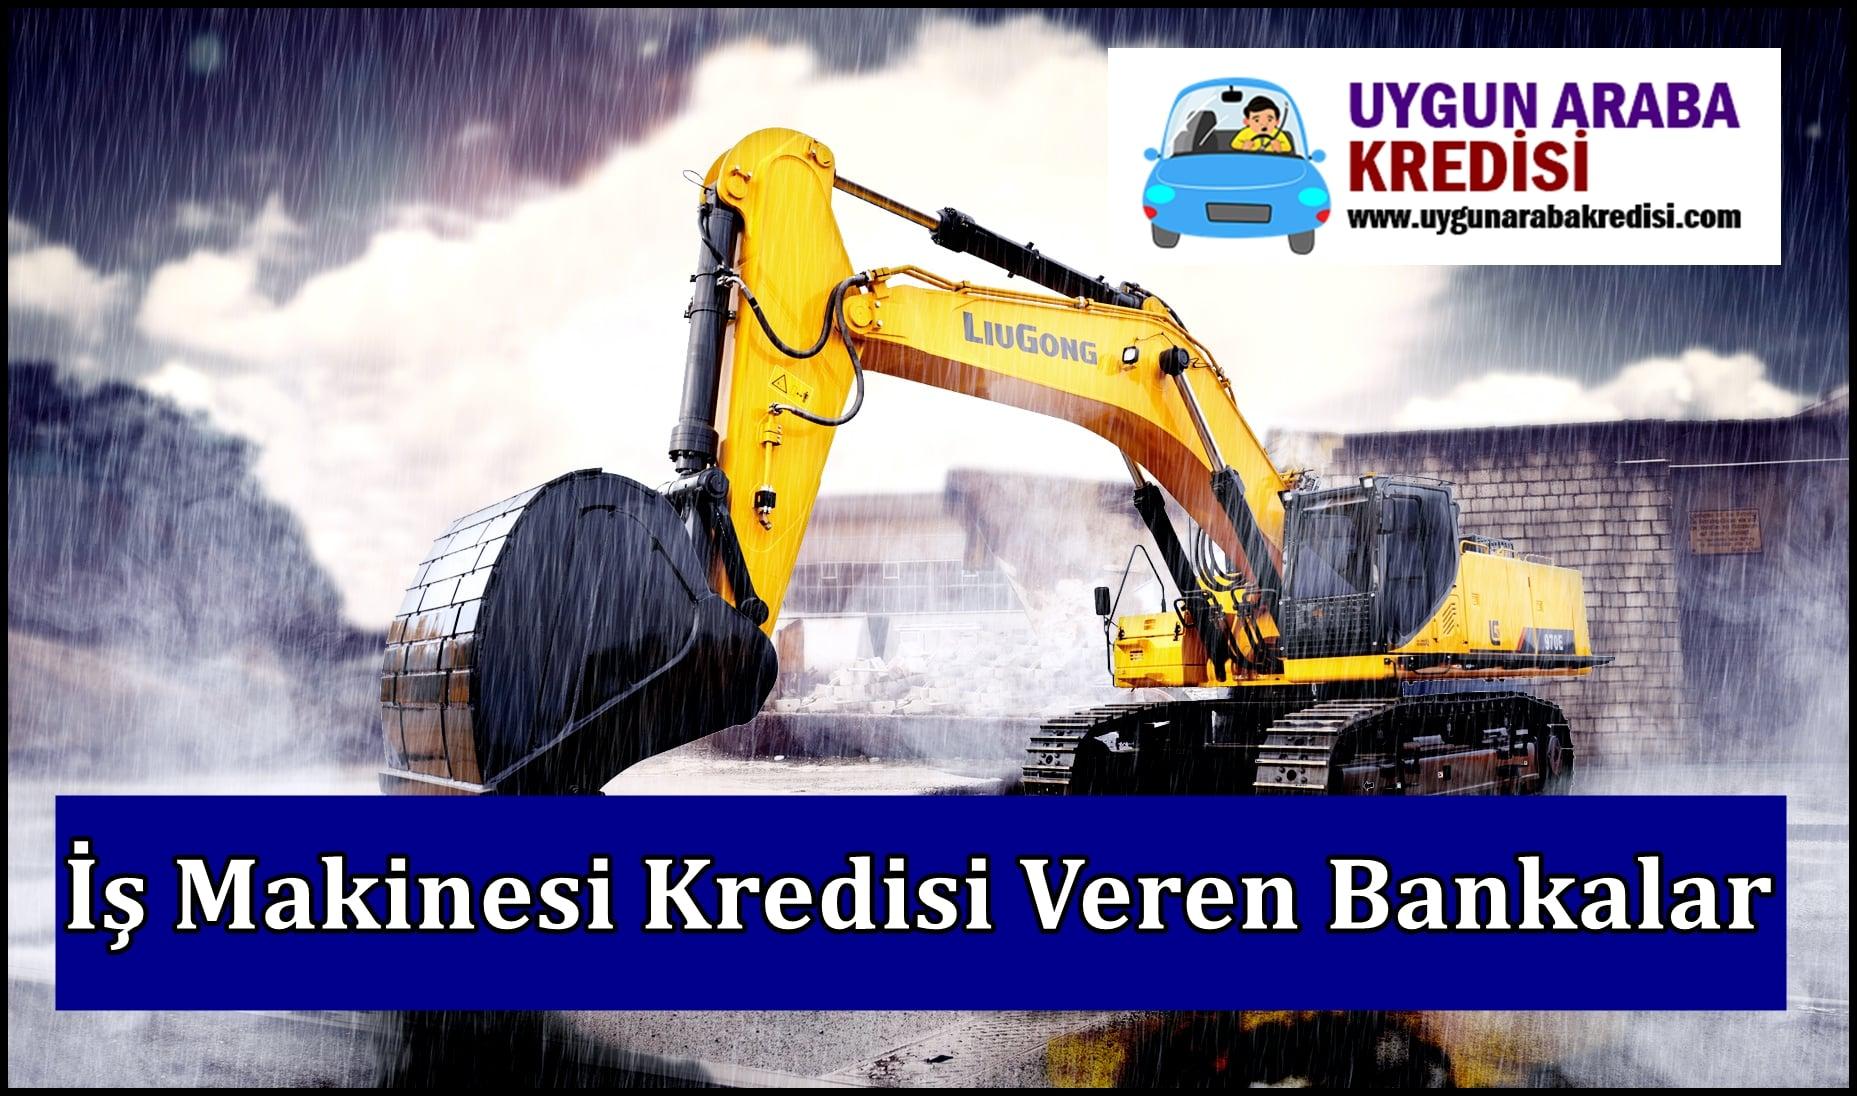 İş Makinesi Kredisi Veren Bankalar (LEASİNG)